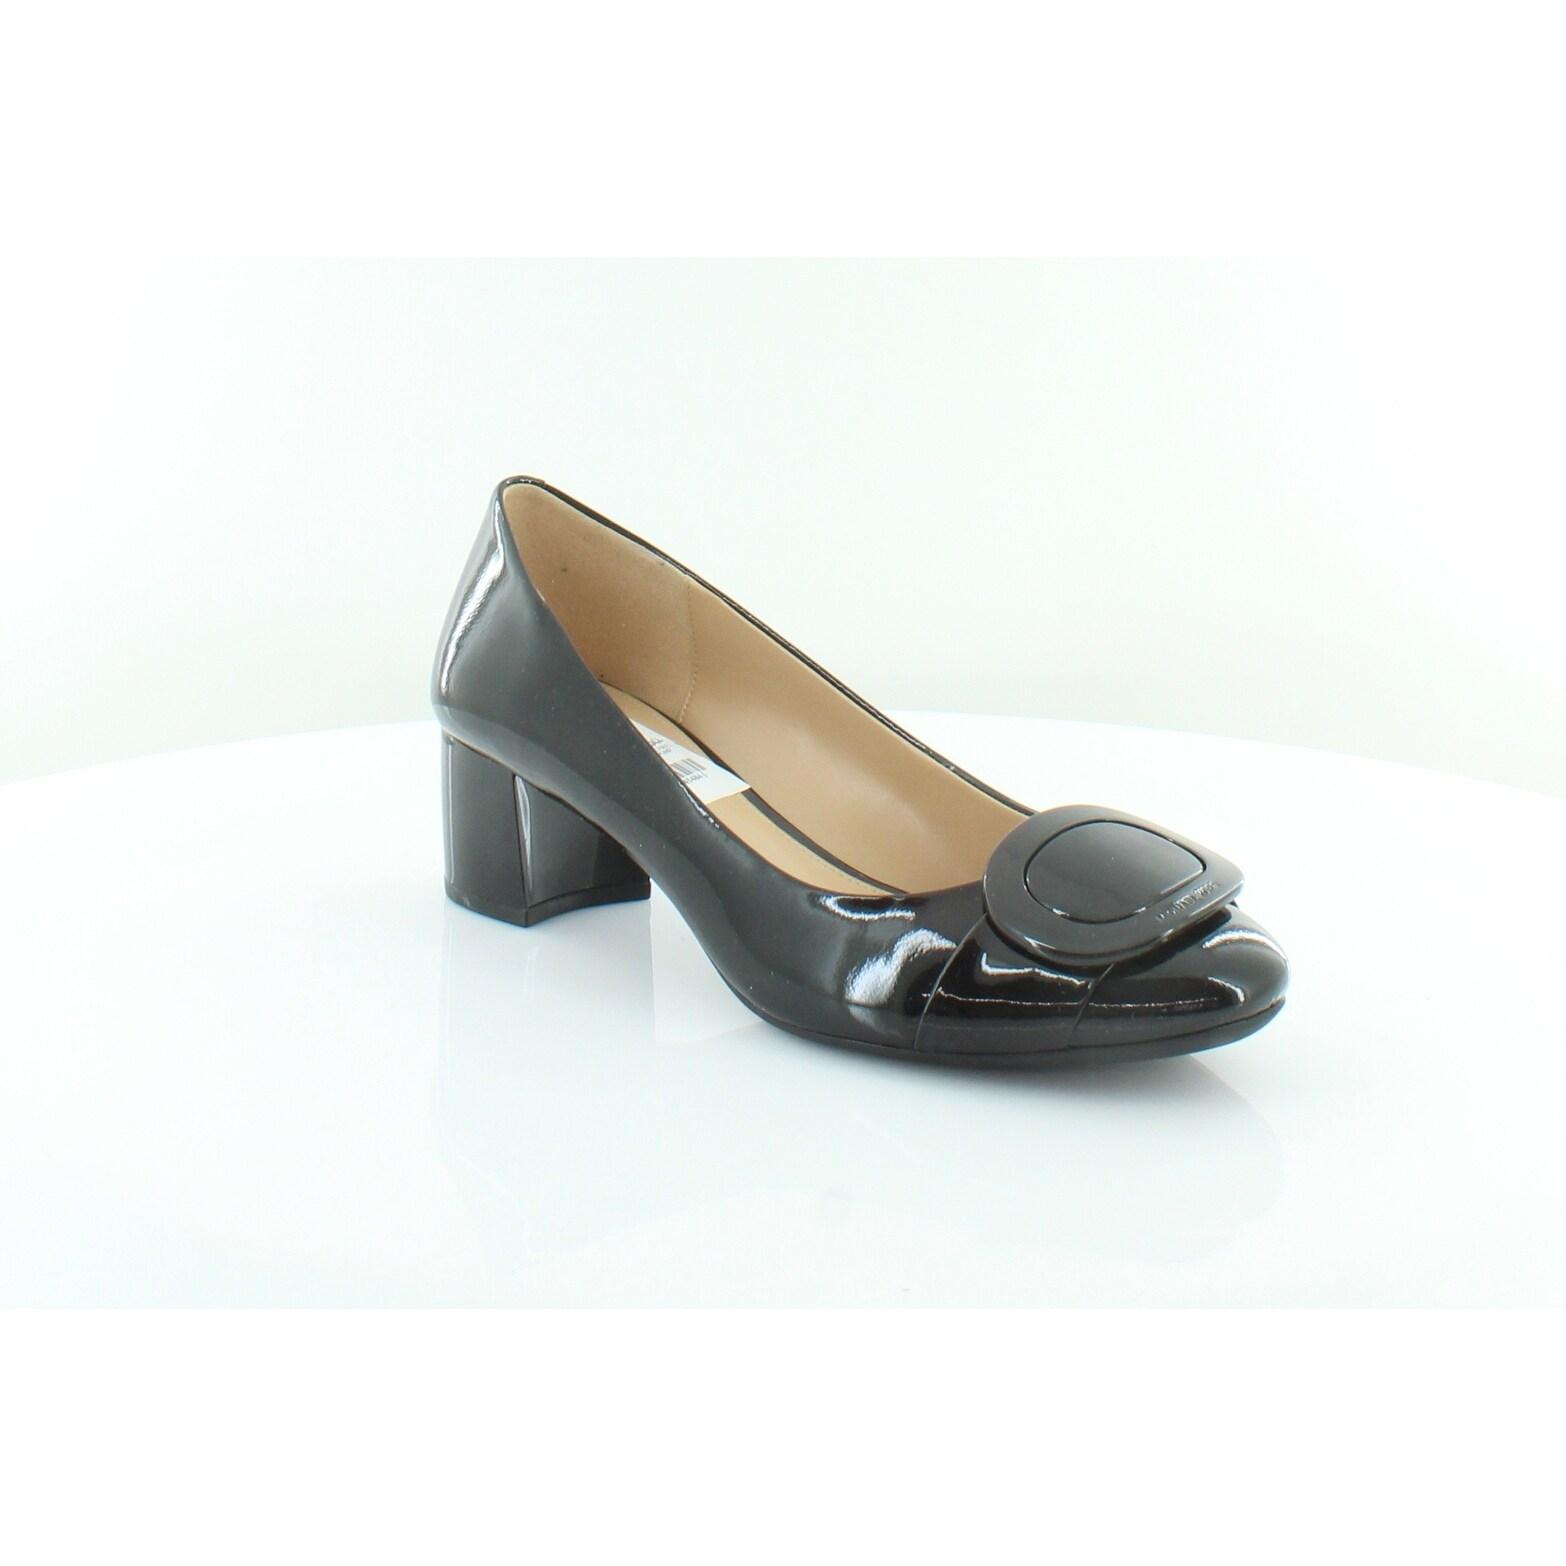 51b2889d5fd5 Shop MICHAEL Michael Kors Pauline Pump Women s Heels Black - Free ...